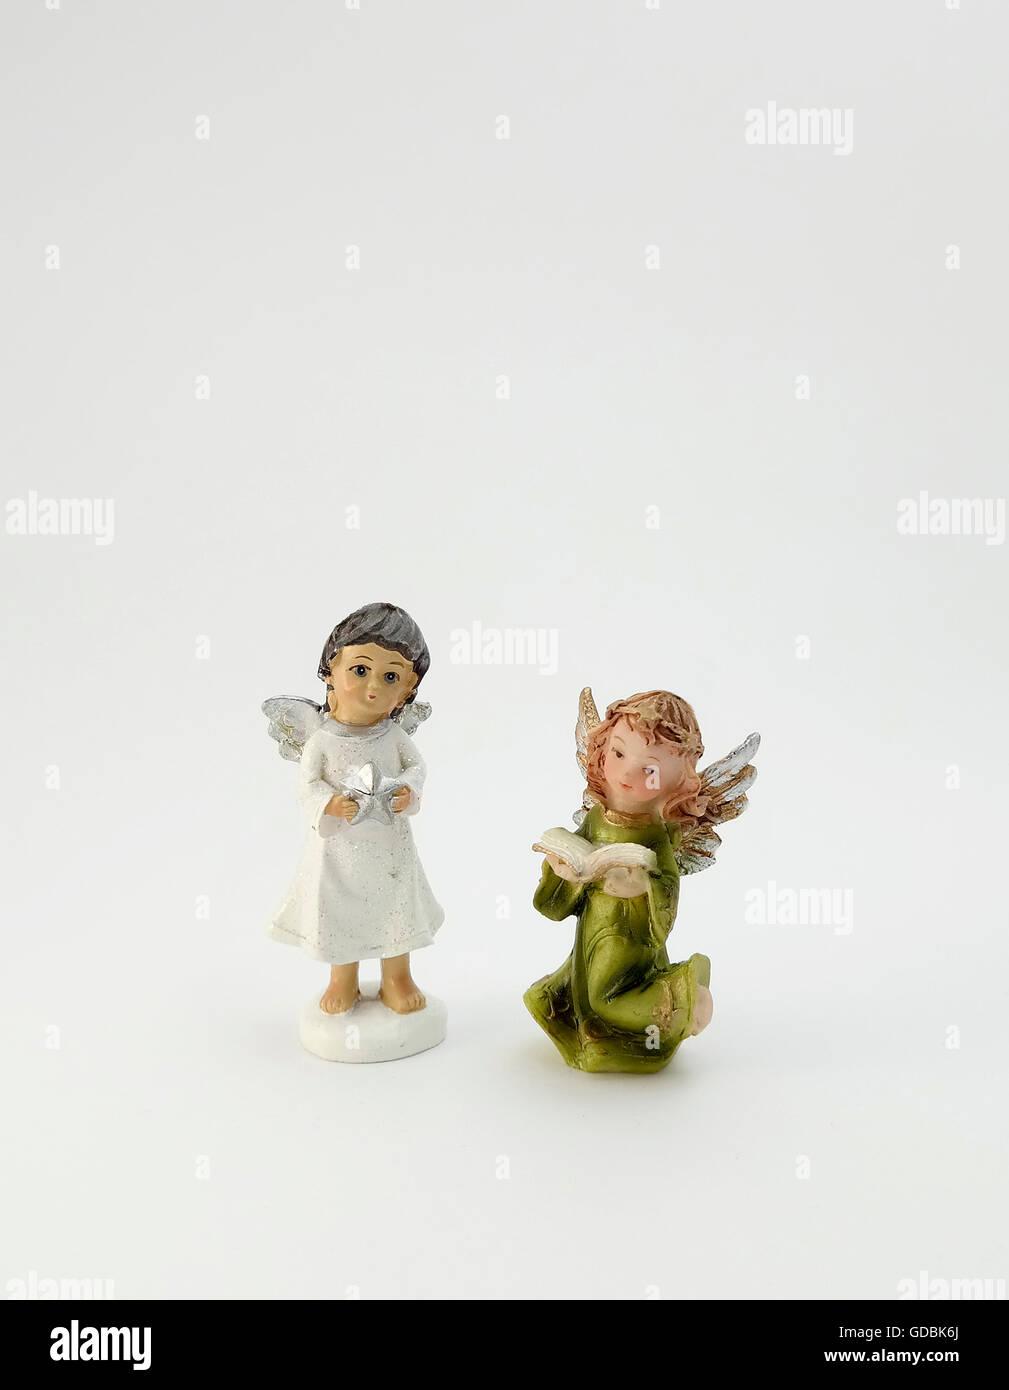 Angel Shaped Christmas Tree.Two Angel Shaped Christmas Tree Ornament Stock Photo